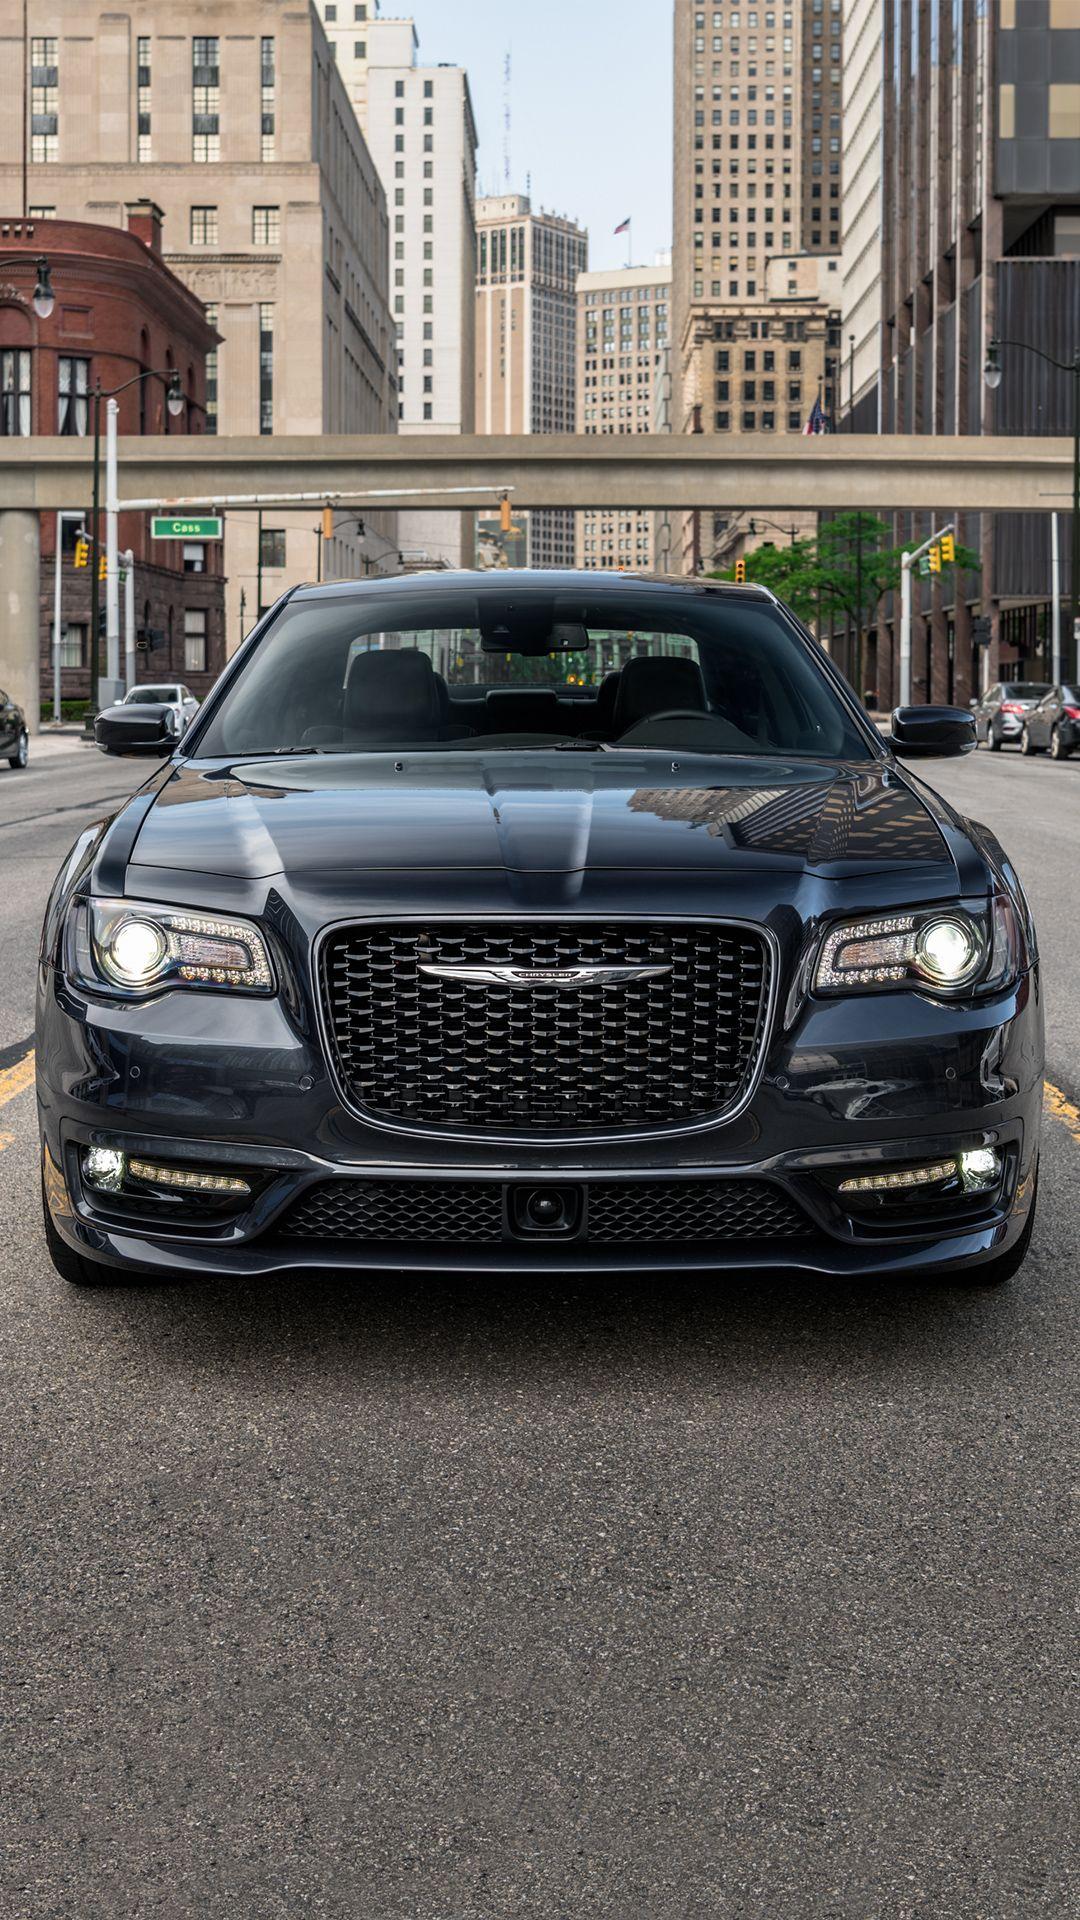 Chrysler 300 Black Grill : chrysler, black, grill, Chrysler, Ideas, Chrysler,